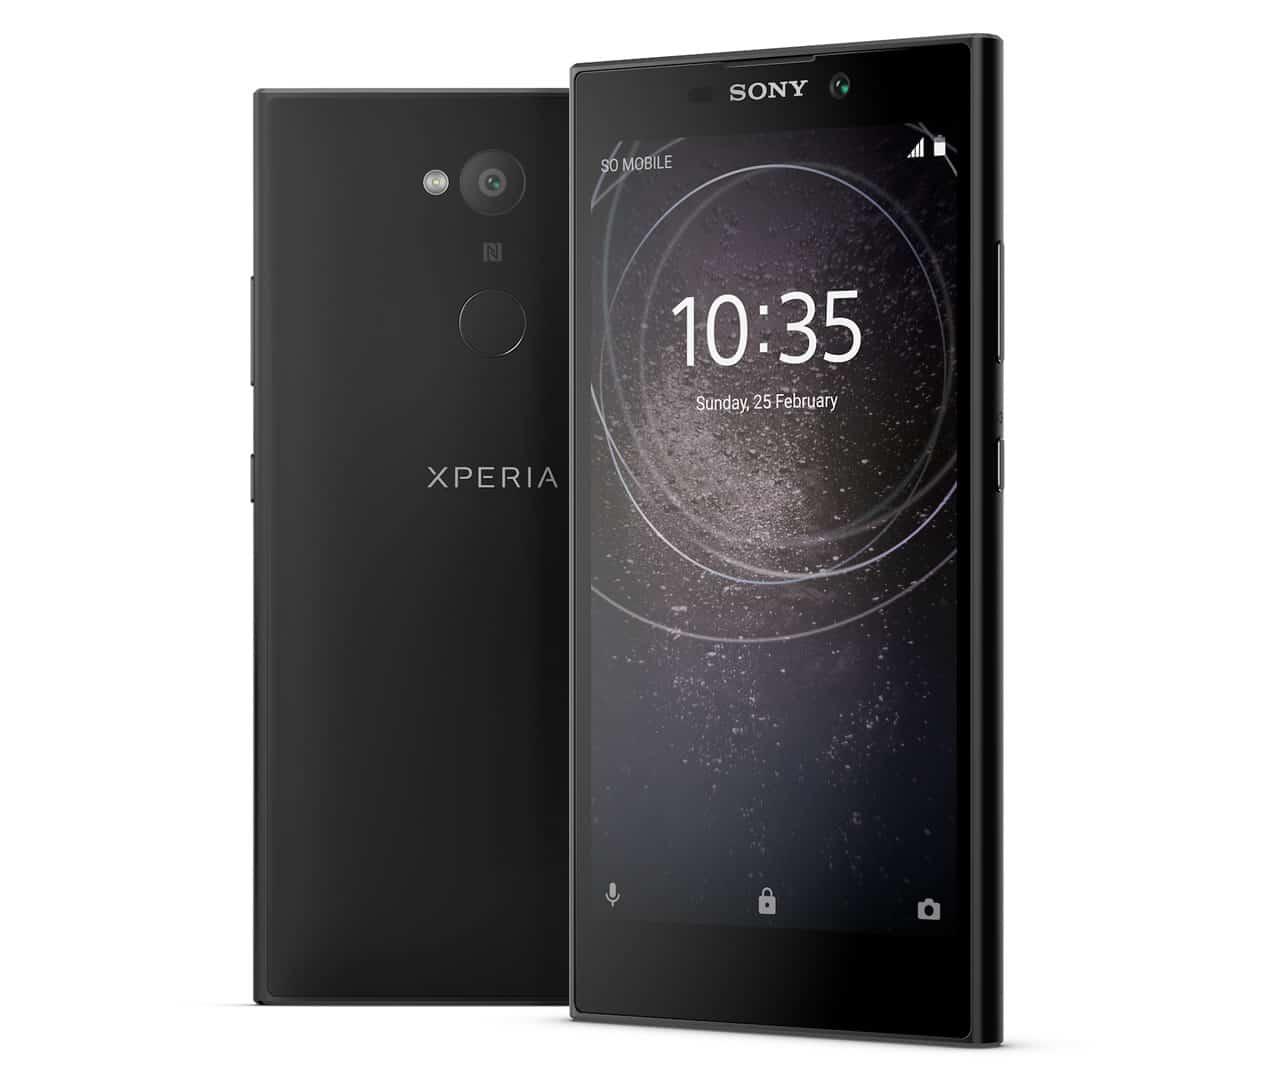 Sony Mobile comienza la venta del Xperia L2 en Chile